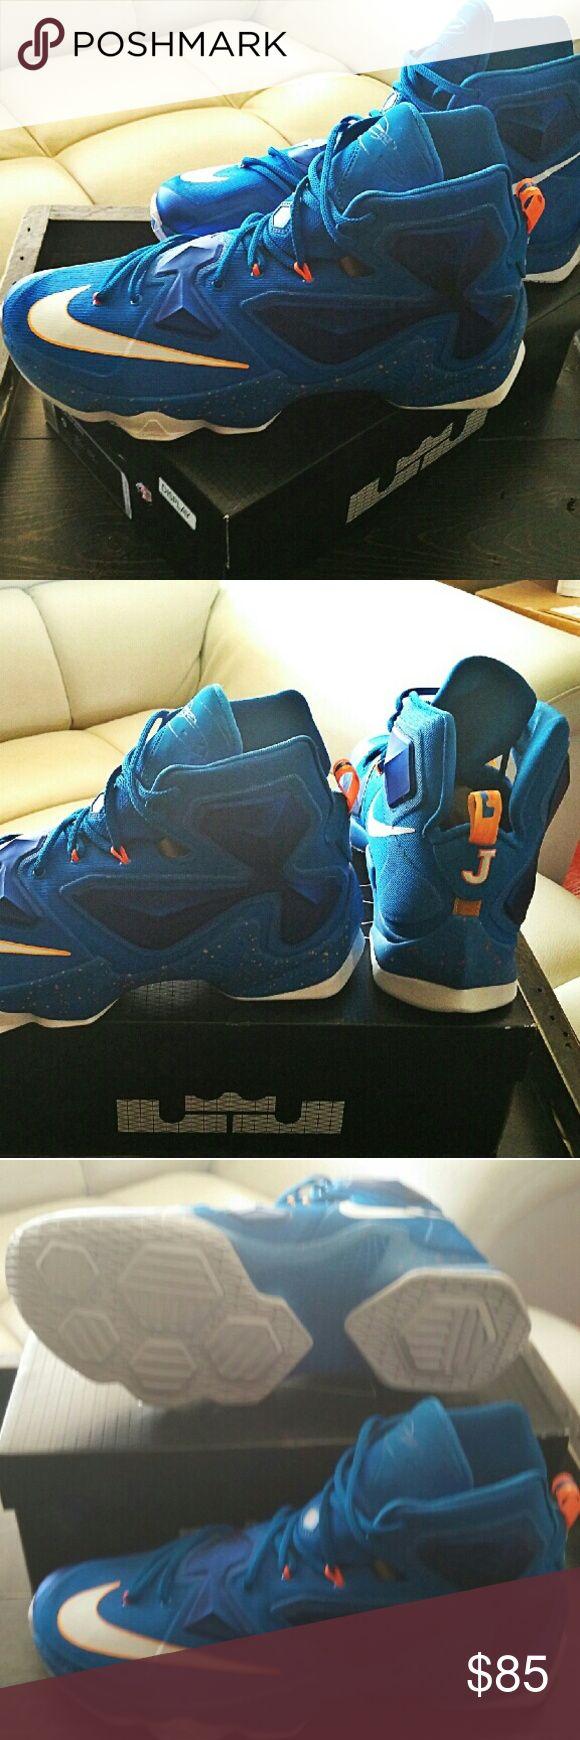 NIKE Lebron XIII Lebron James XIII High Top Blue Orange/White - Brand New Never Worn. Nike Shoes Sneakers